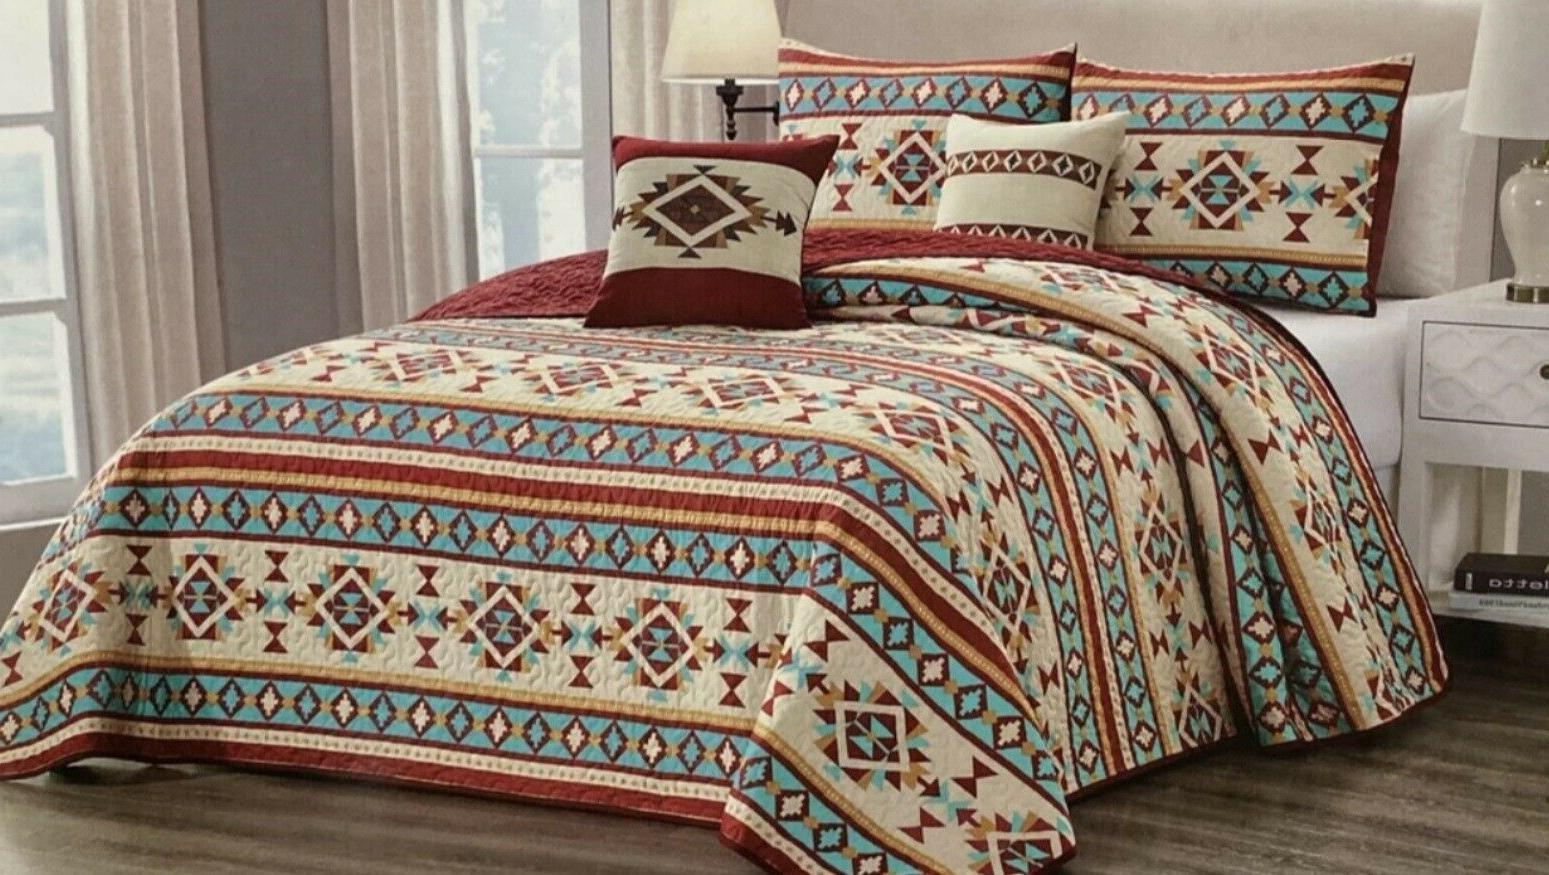 Quilt Reversible Southwest Aztec Lodge Bedspread King Gift